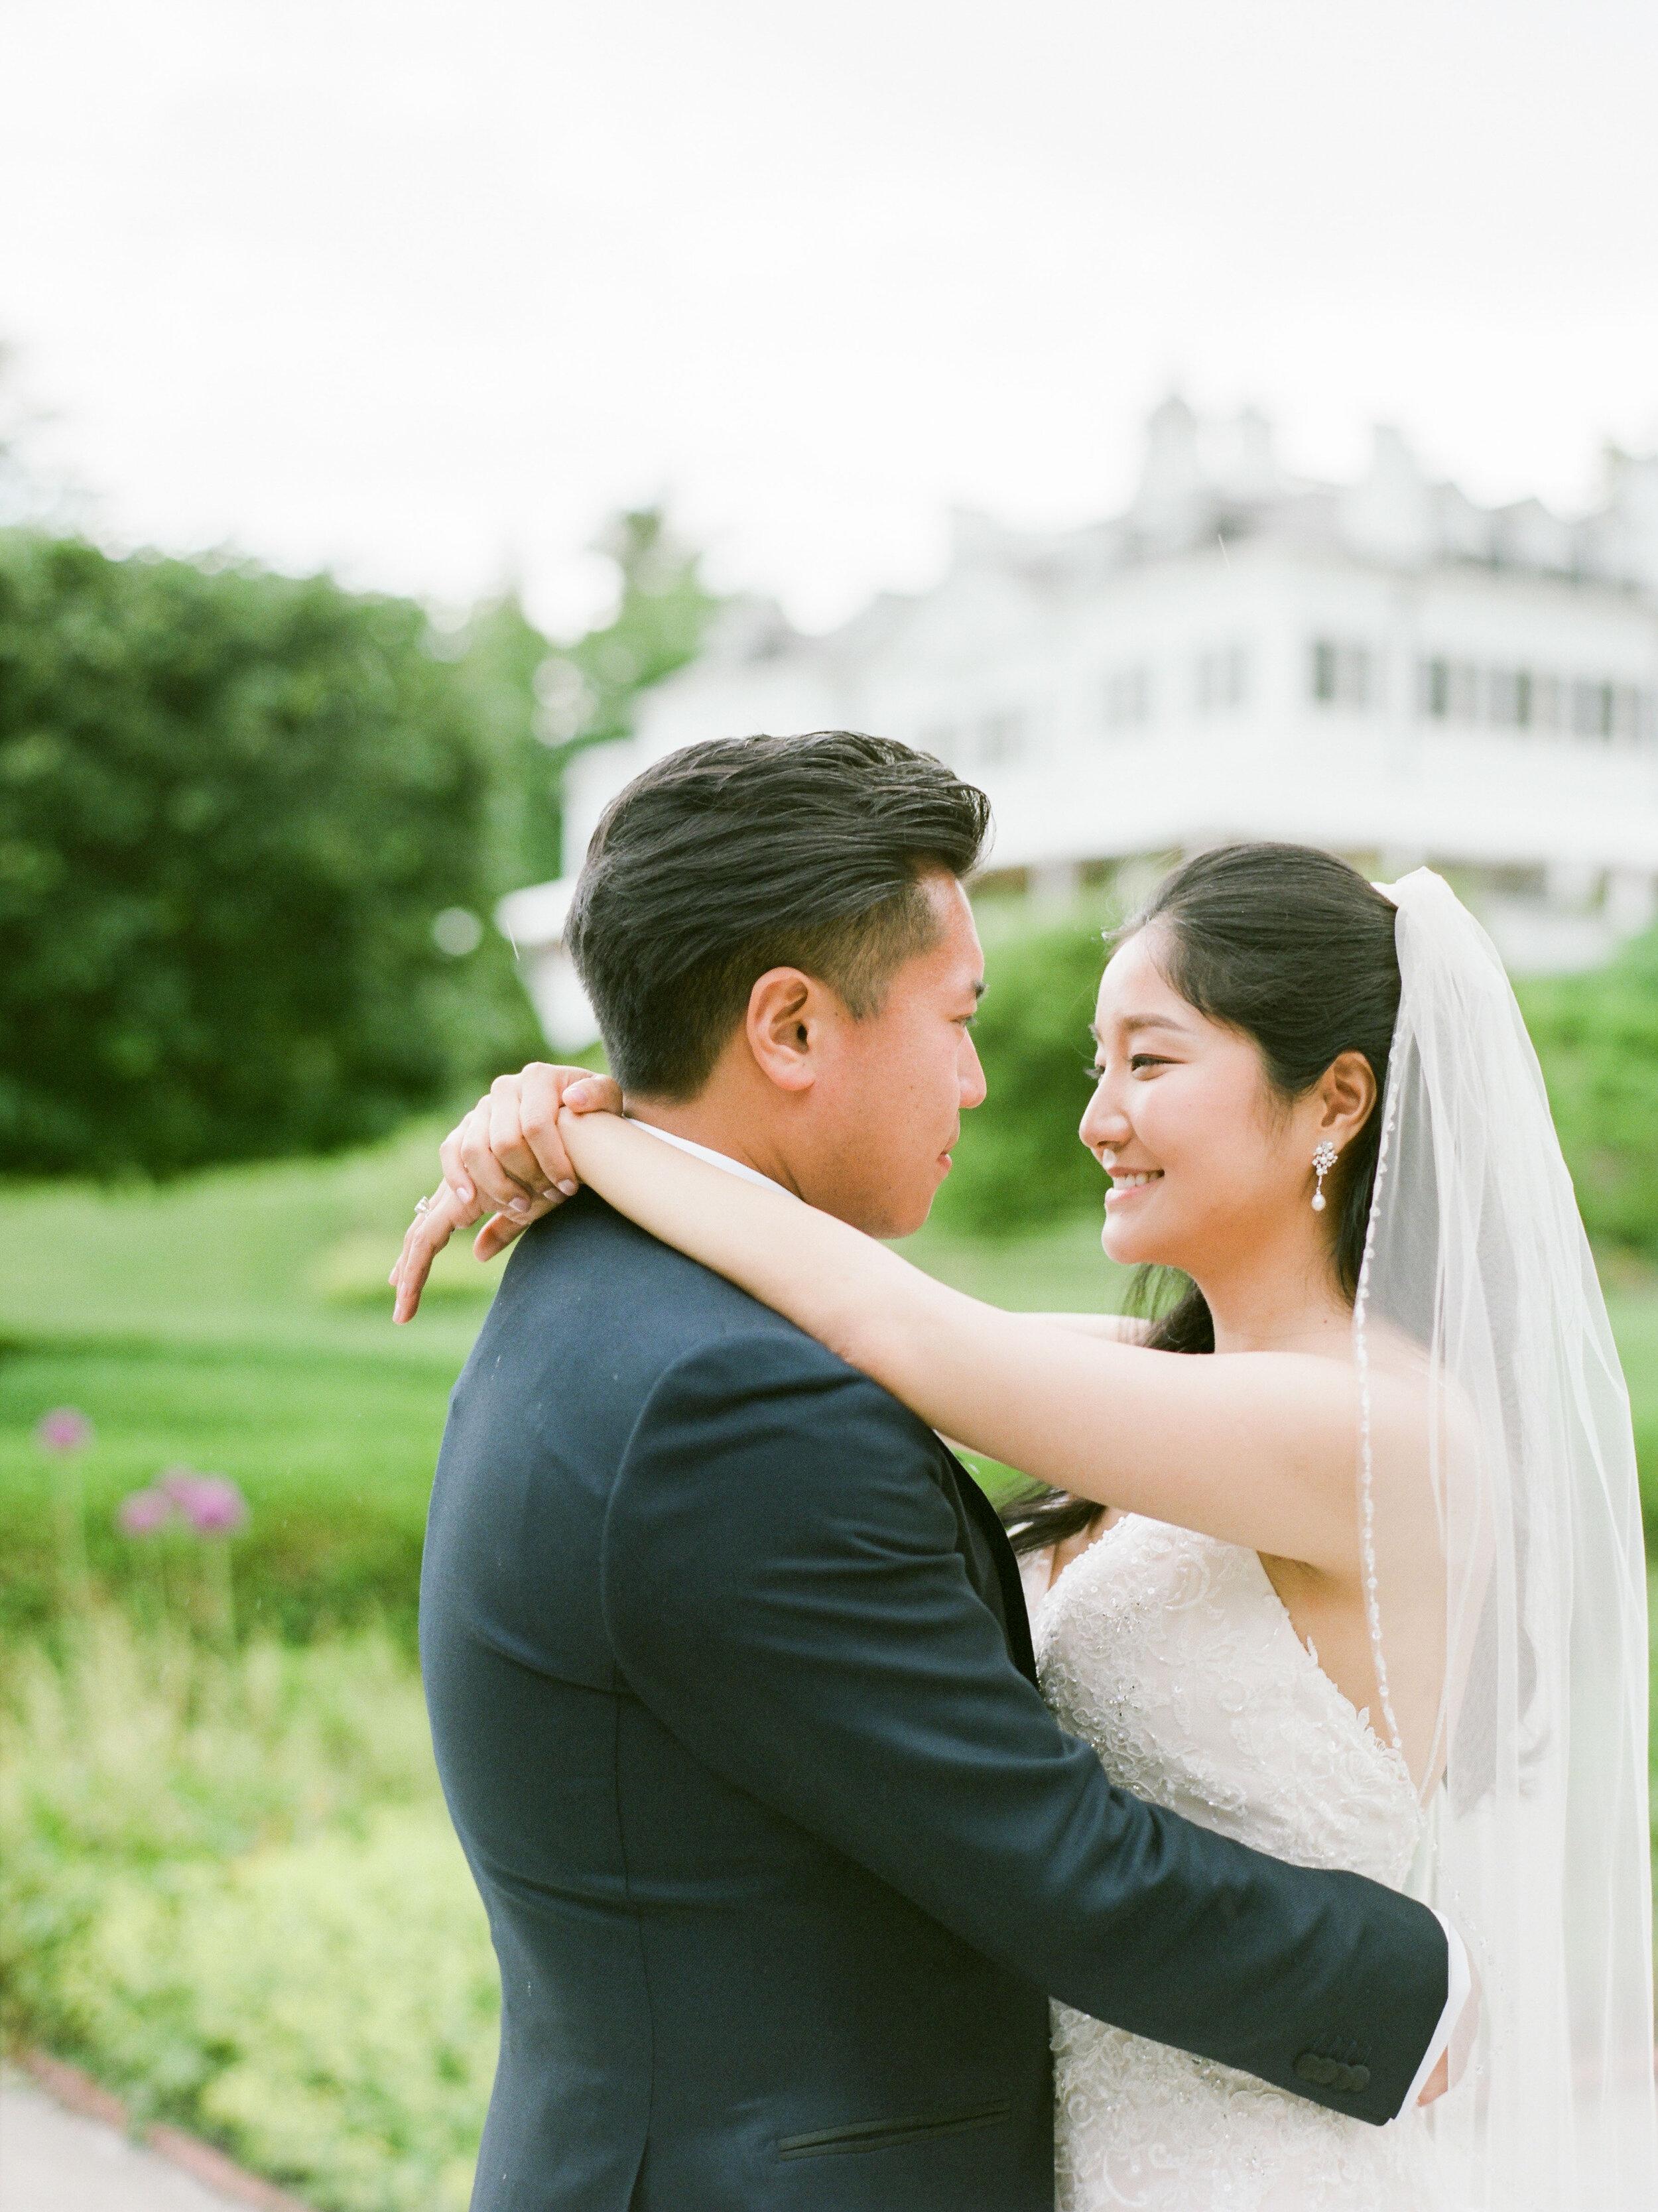 Wedding Photography near Northampton MA